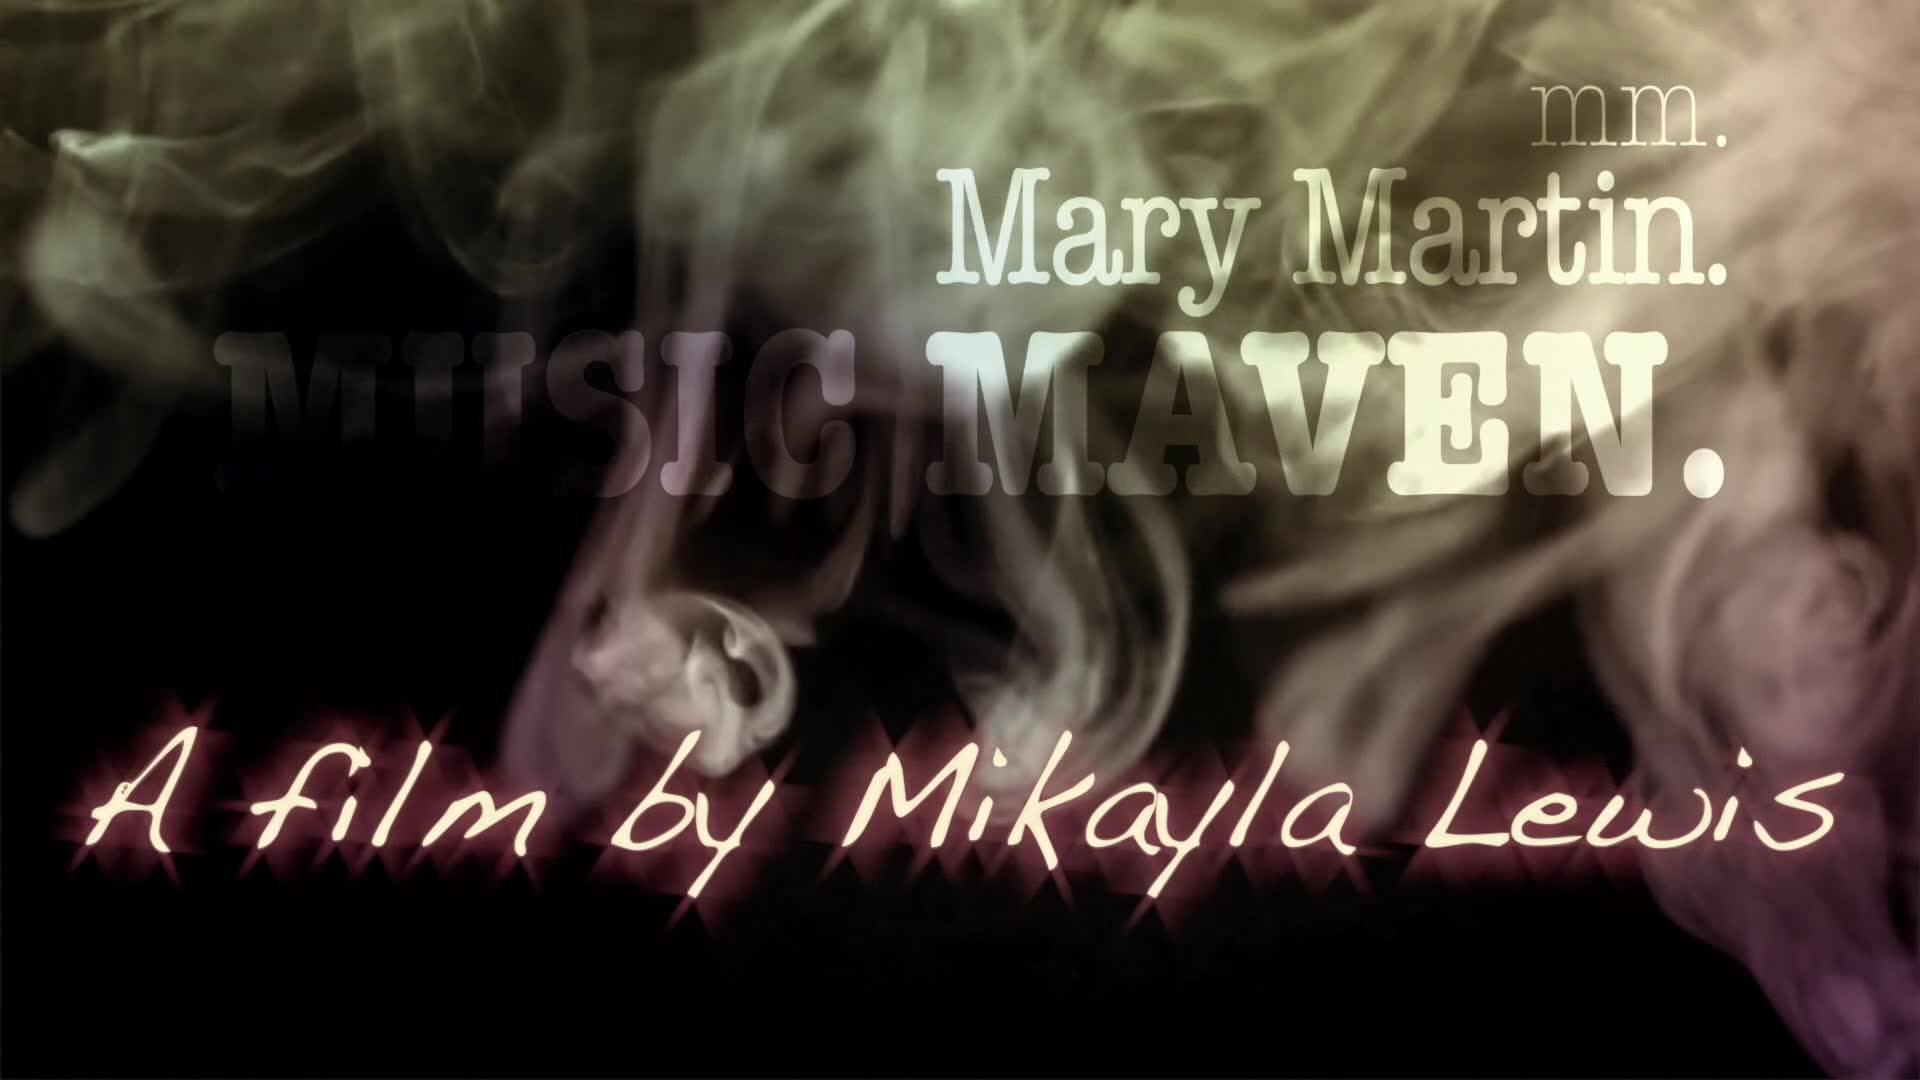 Mary Martin Documentary IndieGoGo Campaign